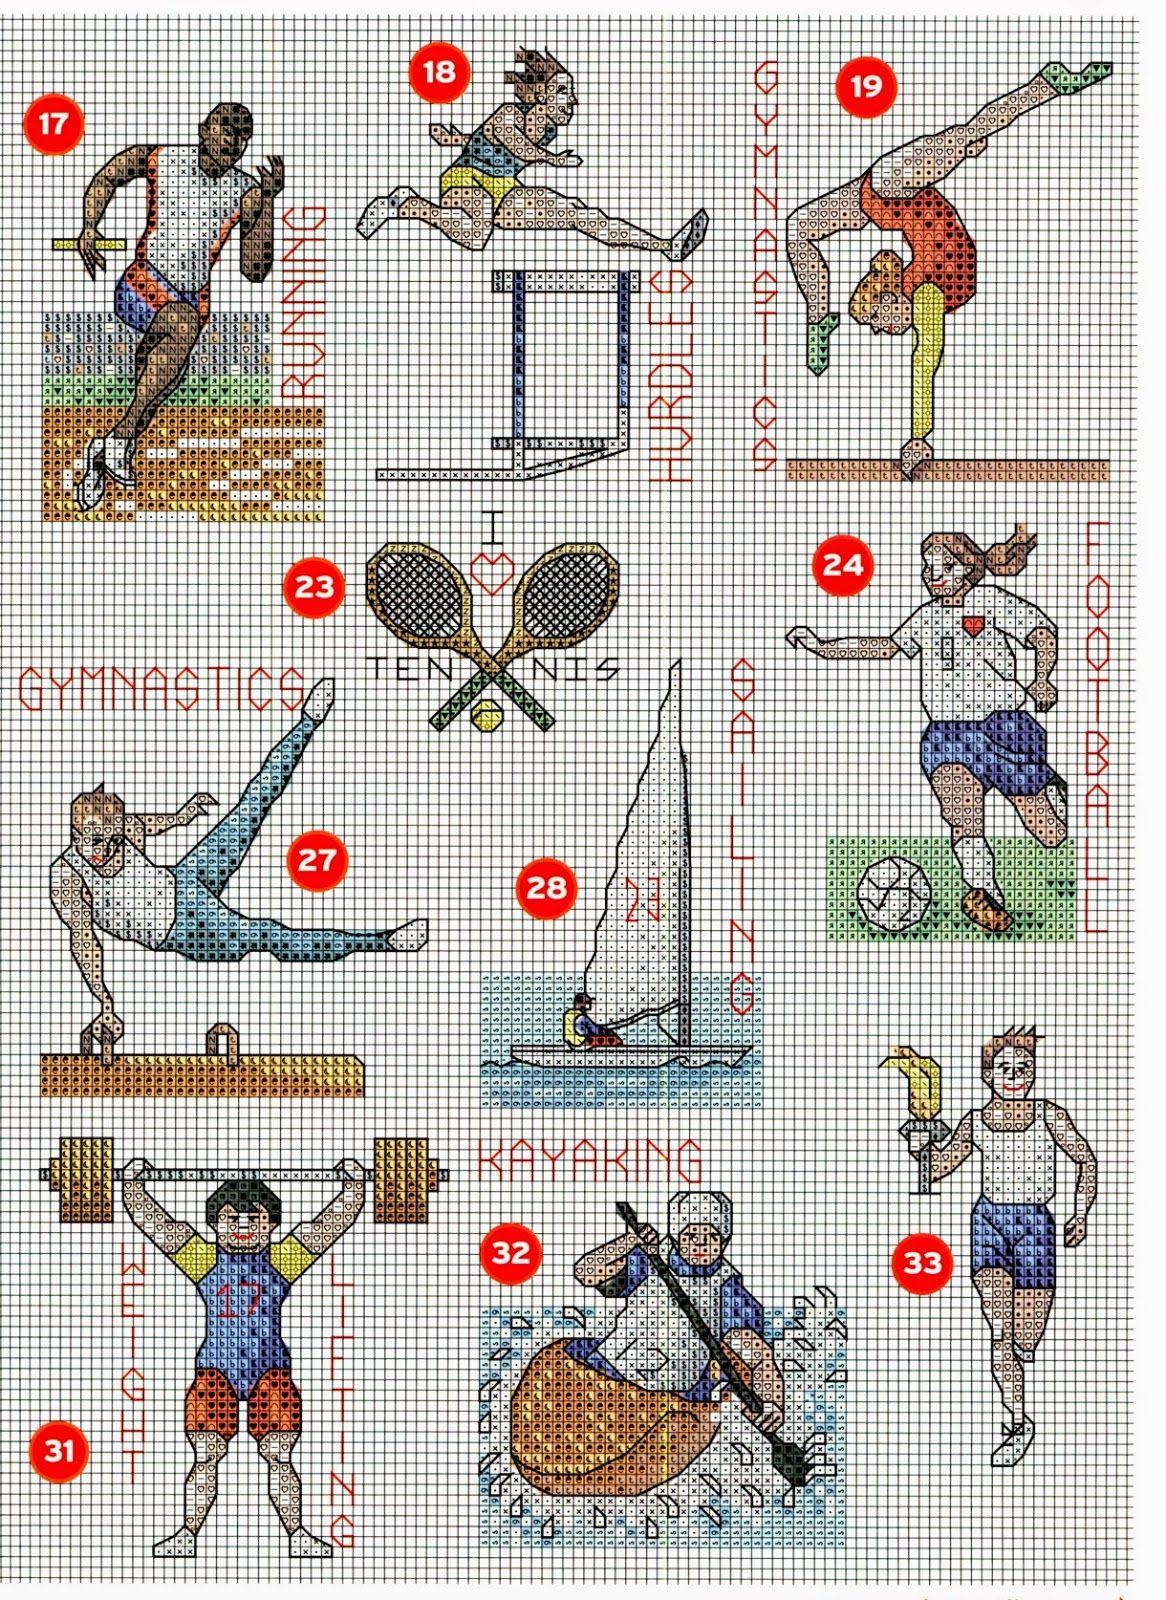 GRAFICOS PUNTO DE CRUZ GRATIS : DEPORTES | deportes | Pinterest ...